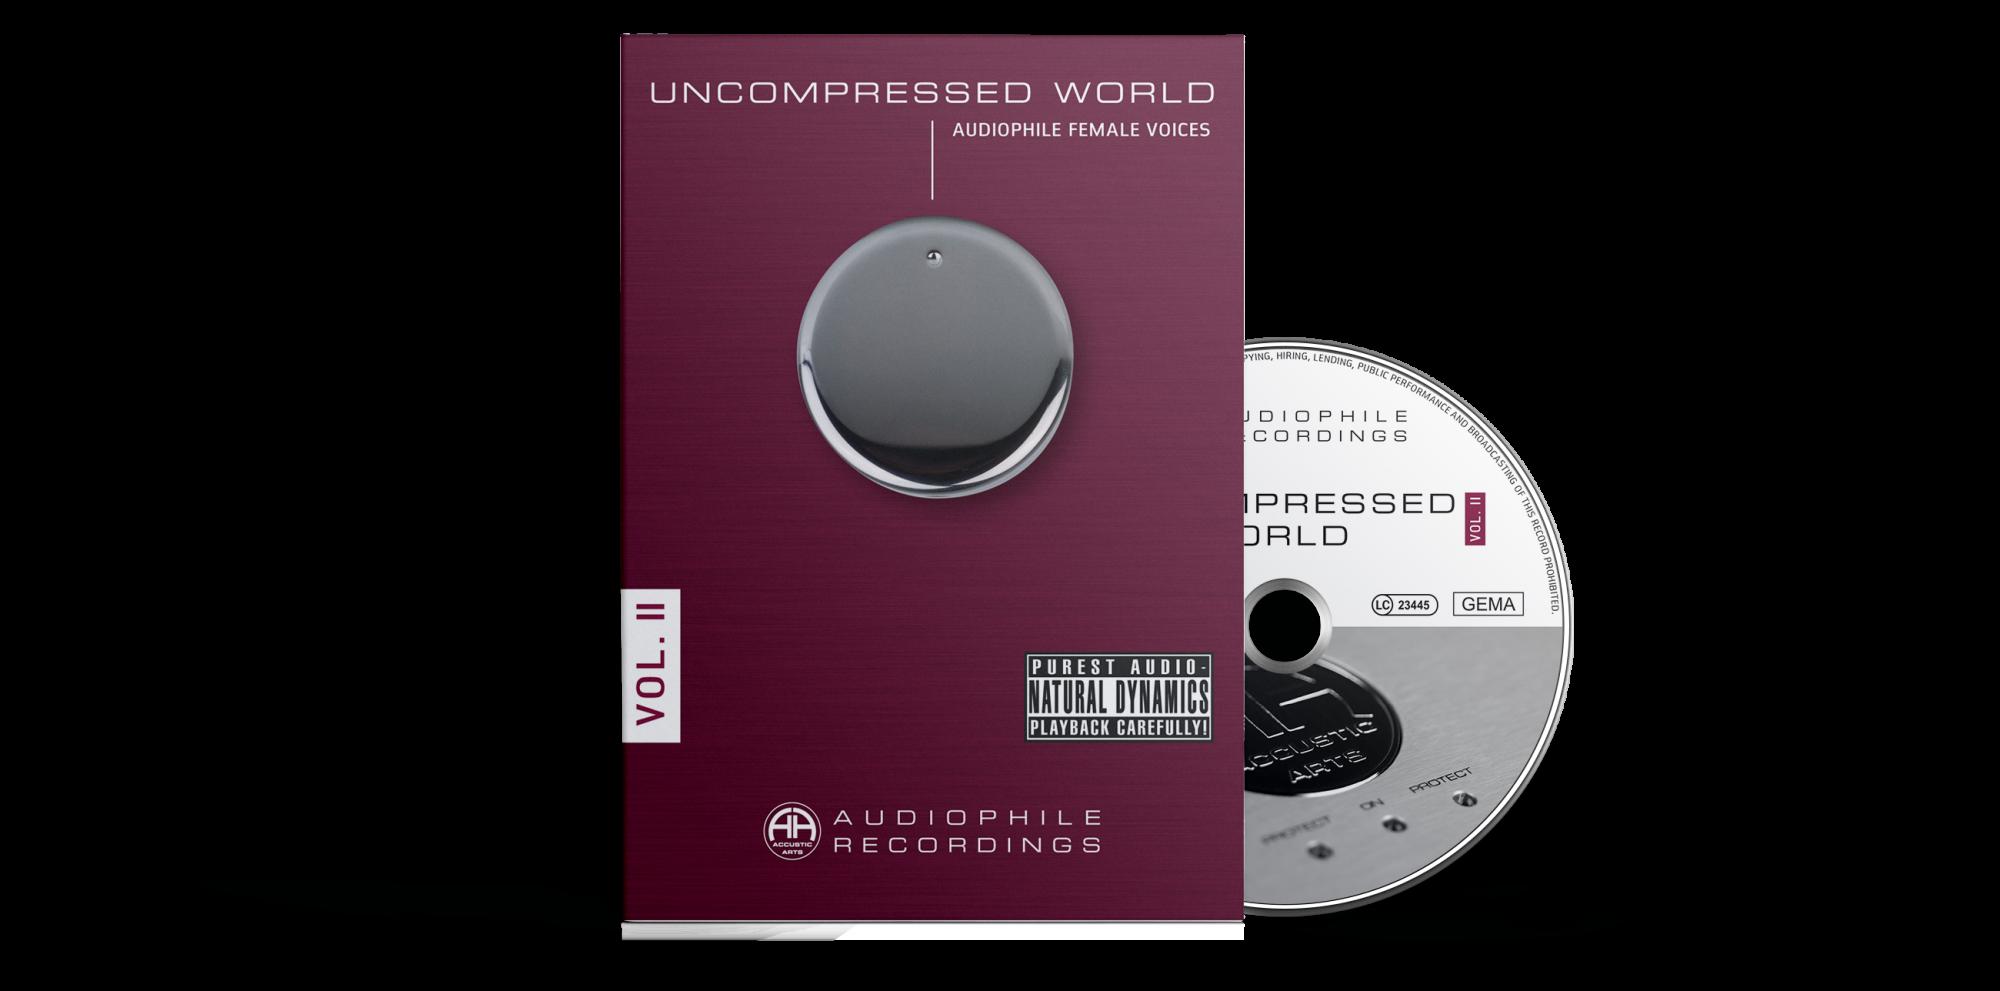 UNCOMPRESSED WORLD VOL. II